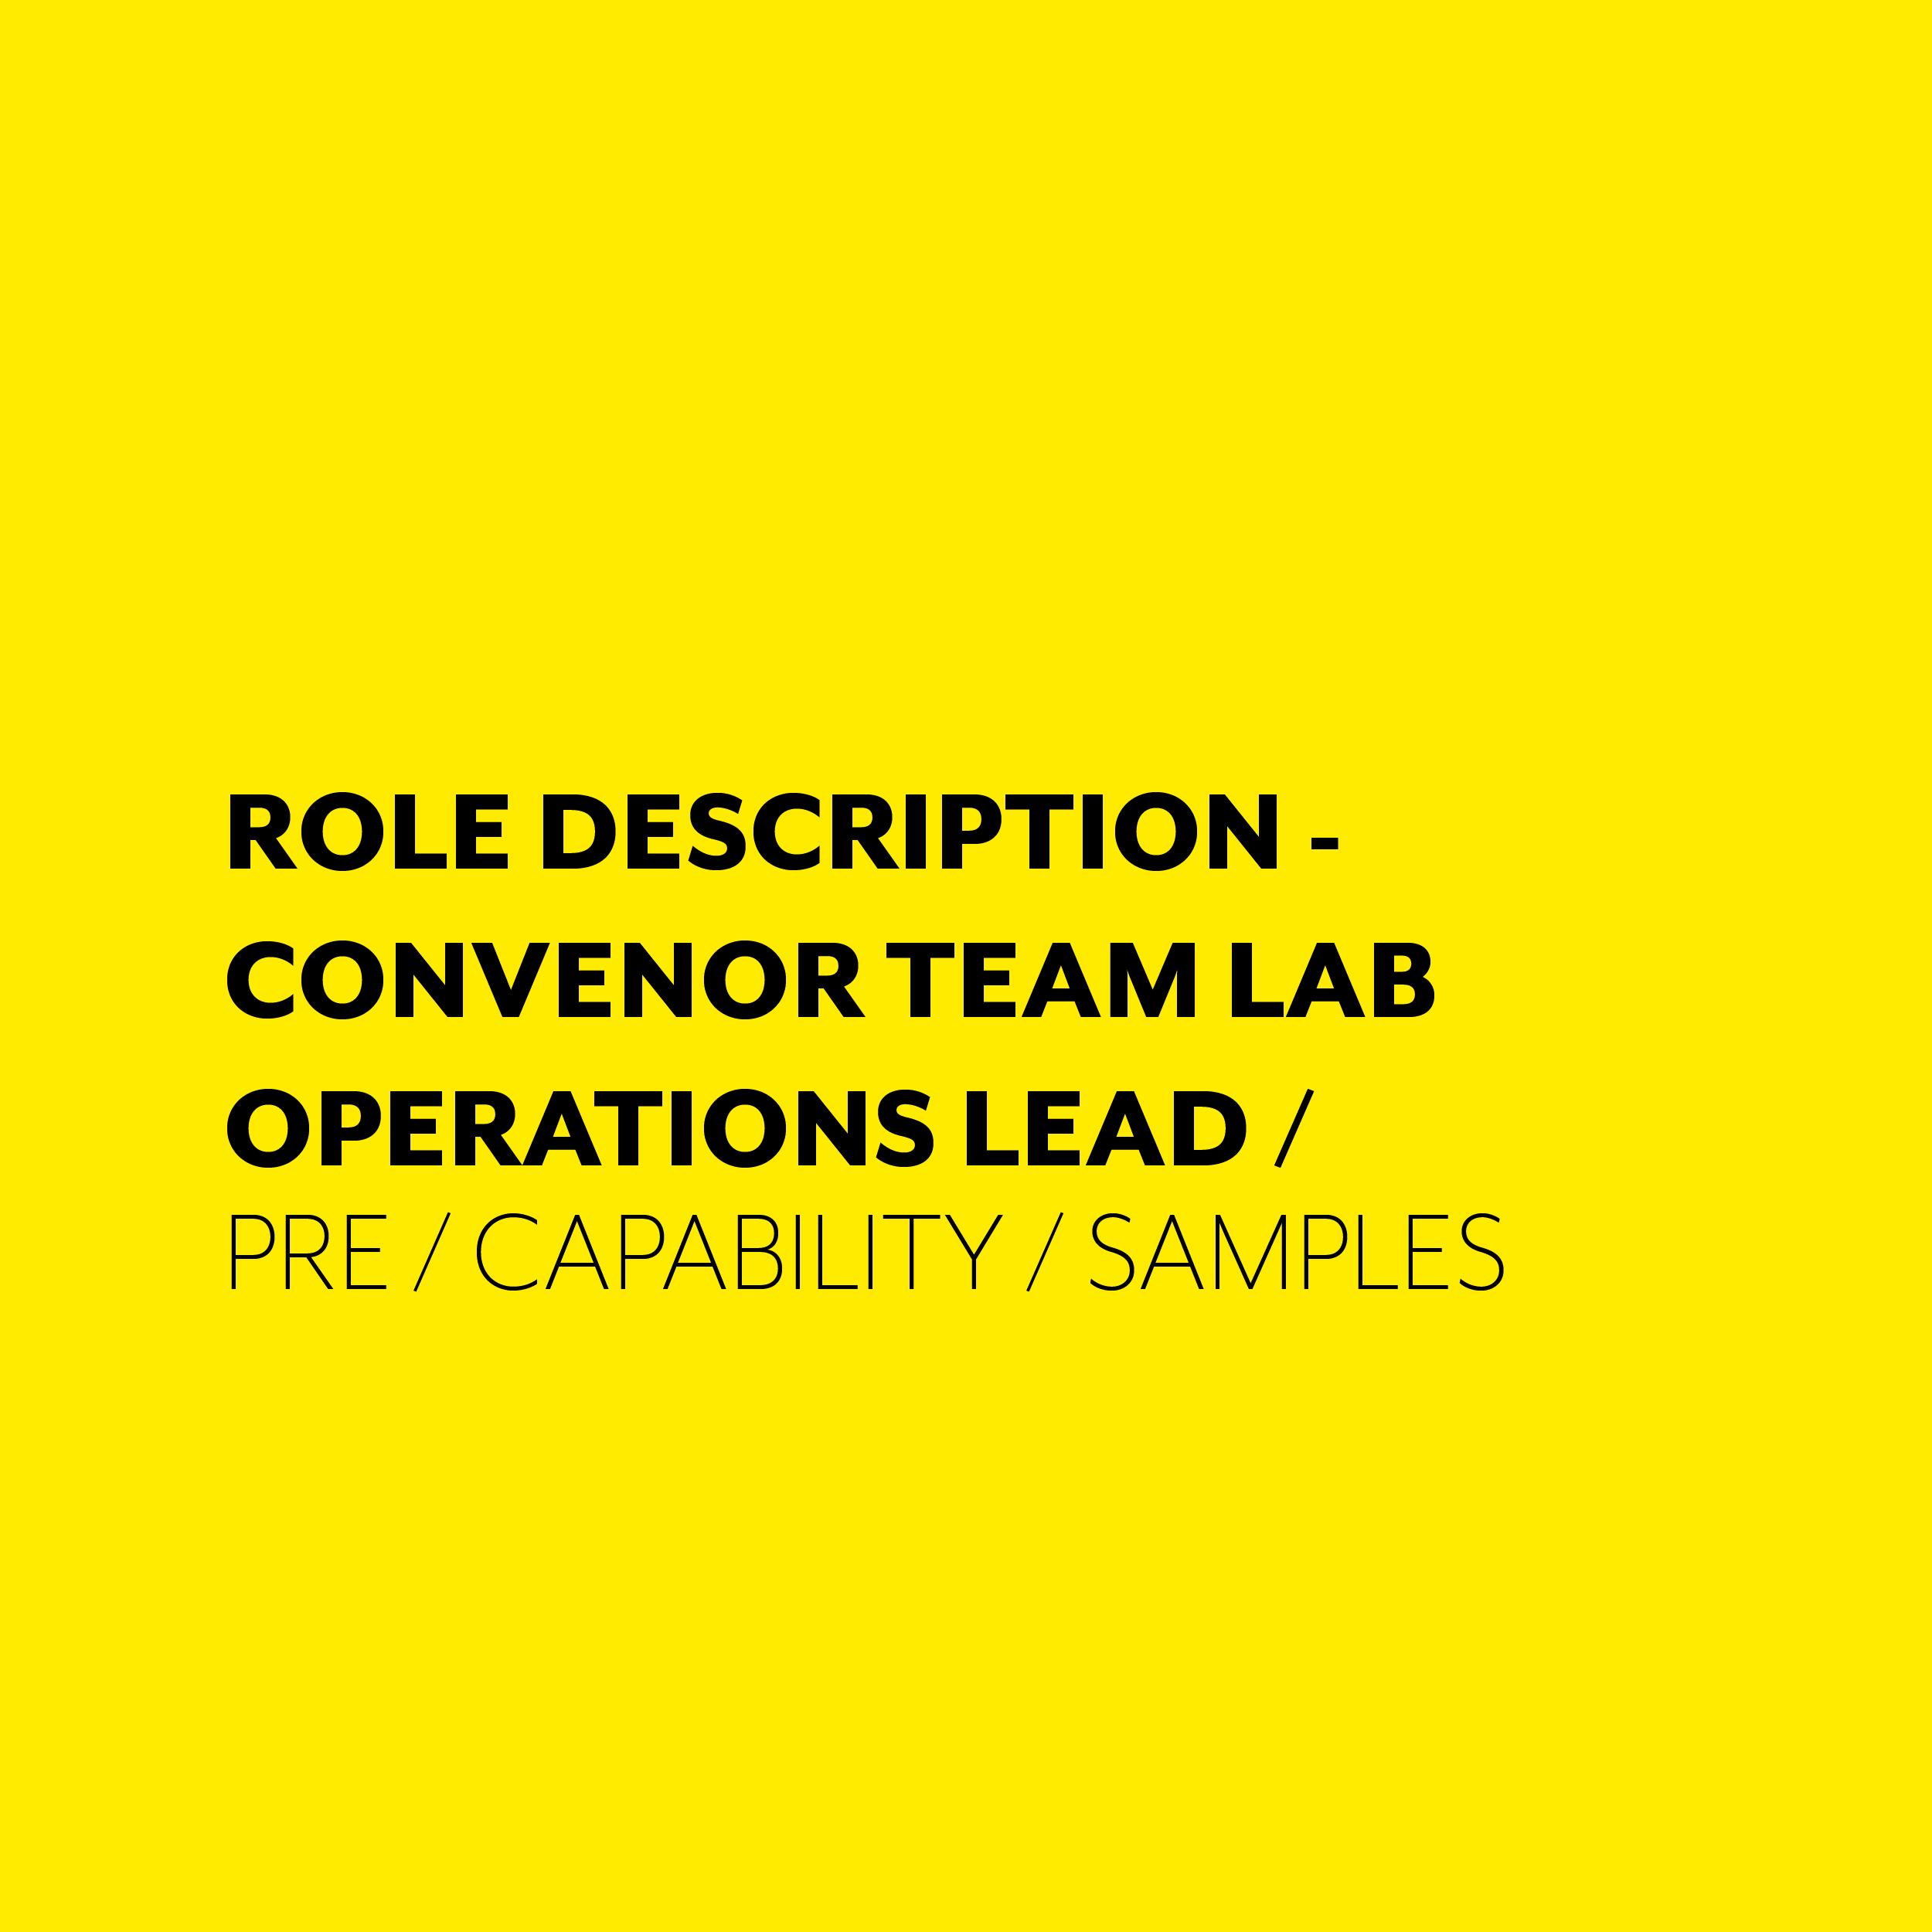 CONVENOR TEAM LAB OPERATIONS LEAD2.jpg